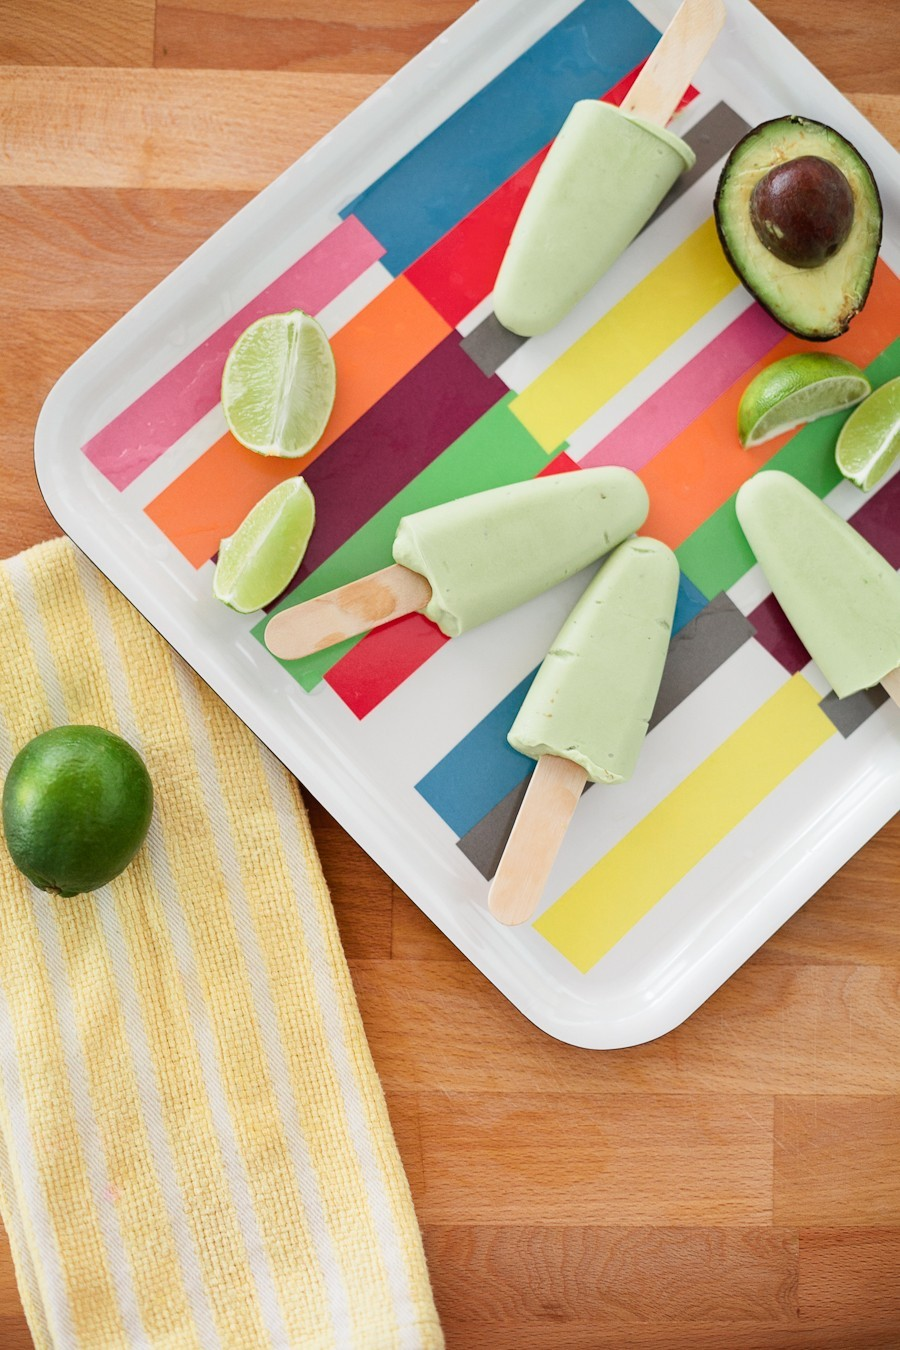 Tropical Avocado Popsicle